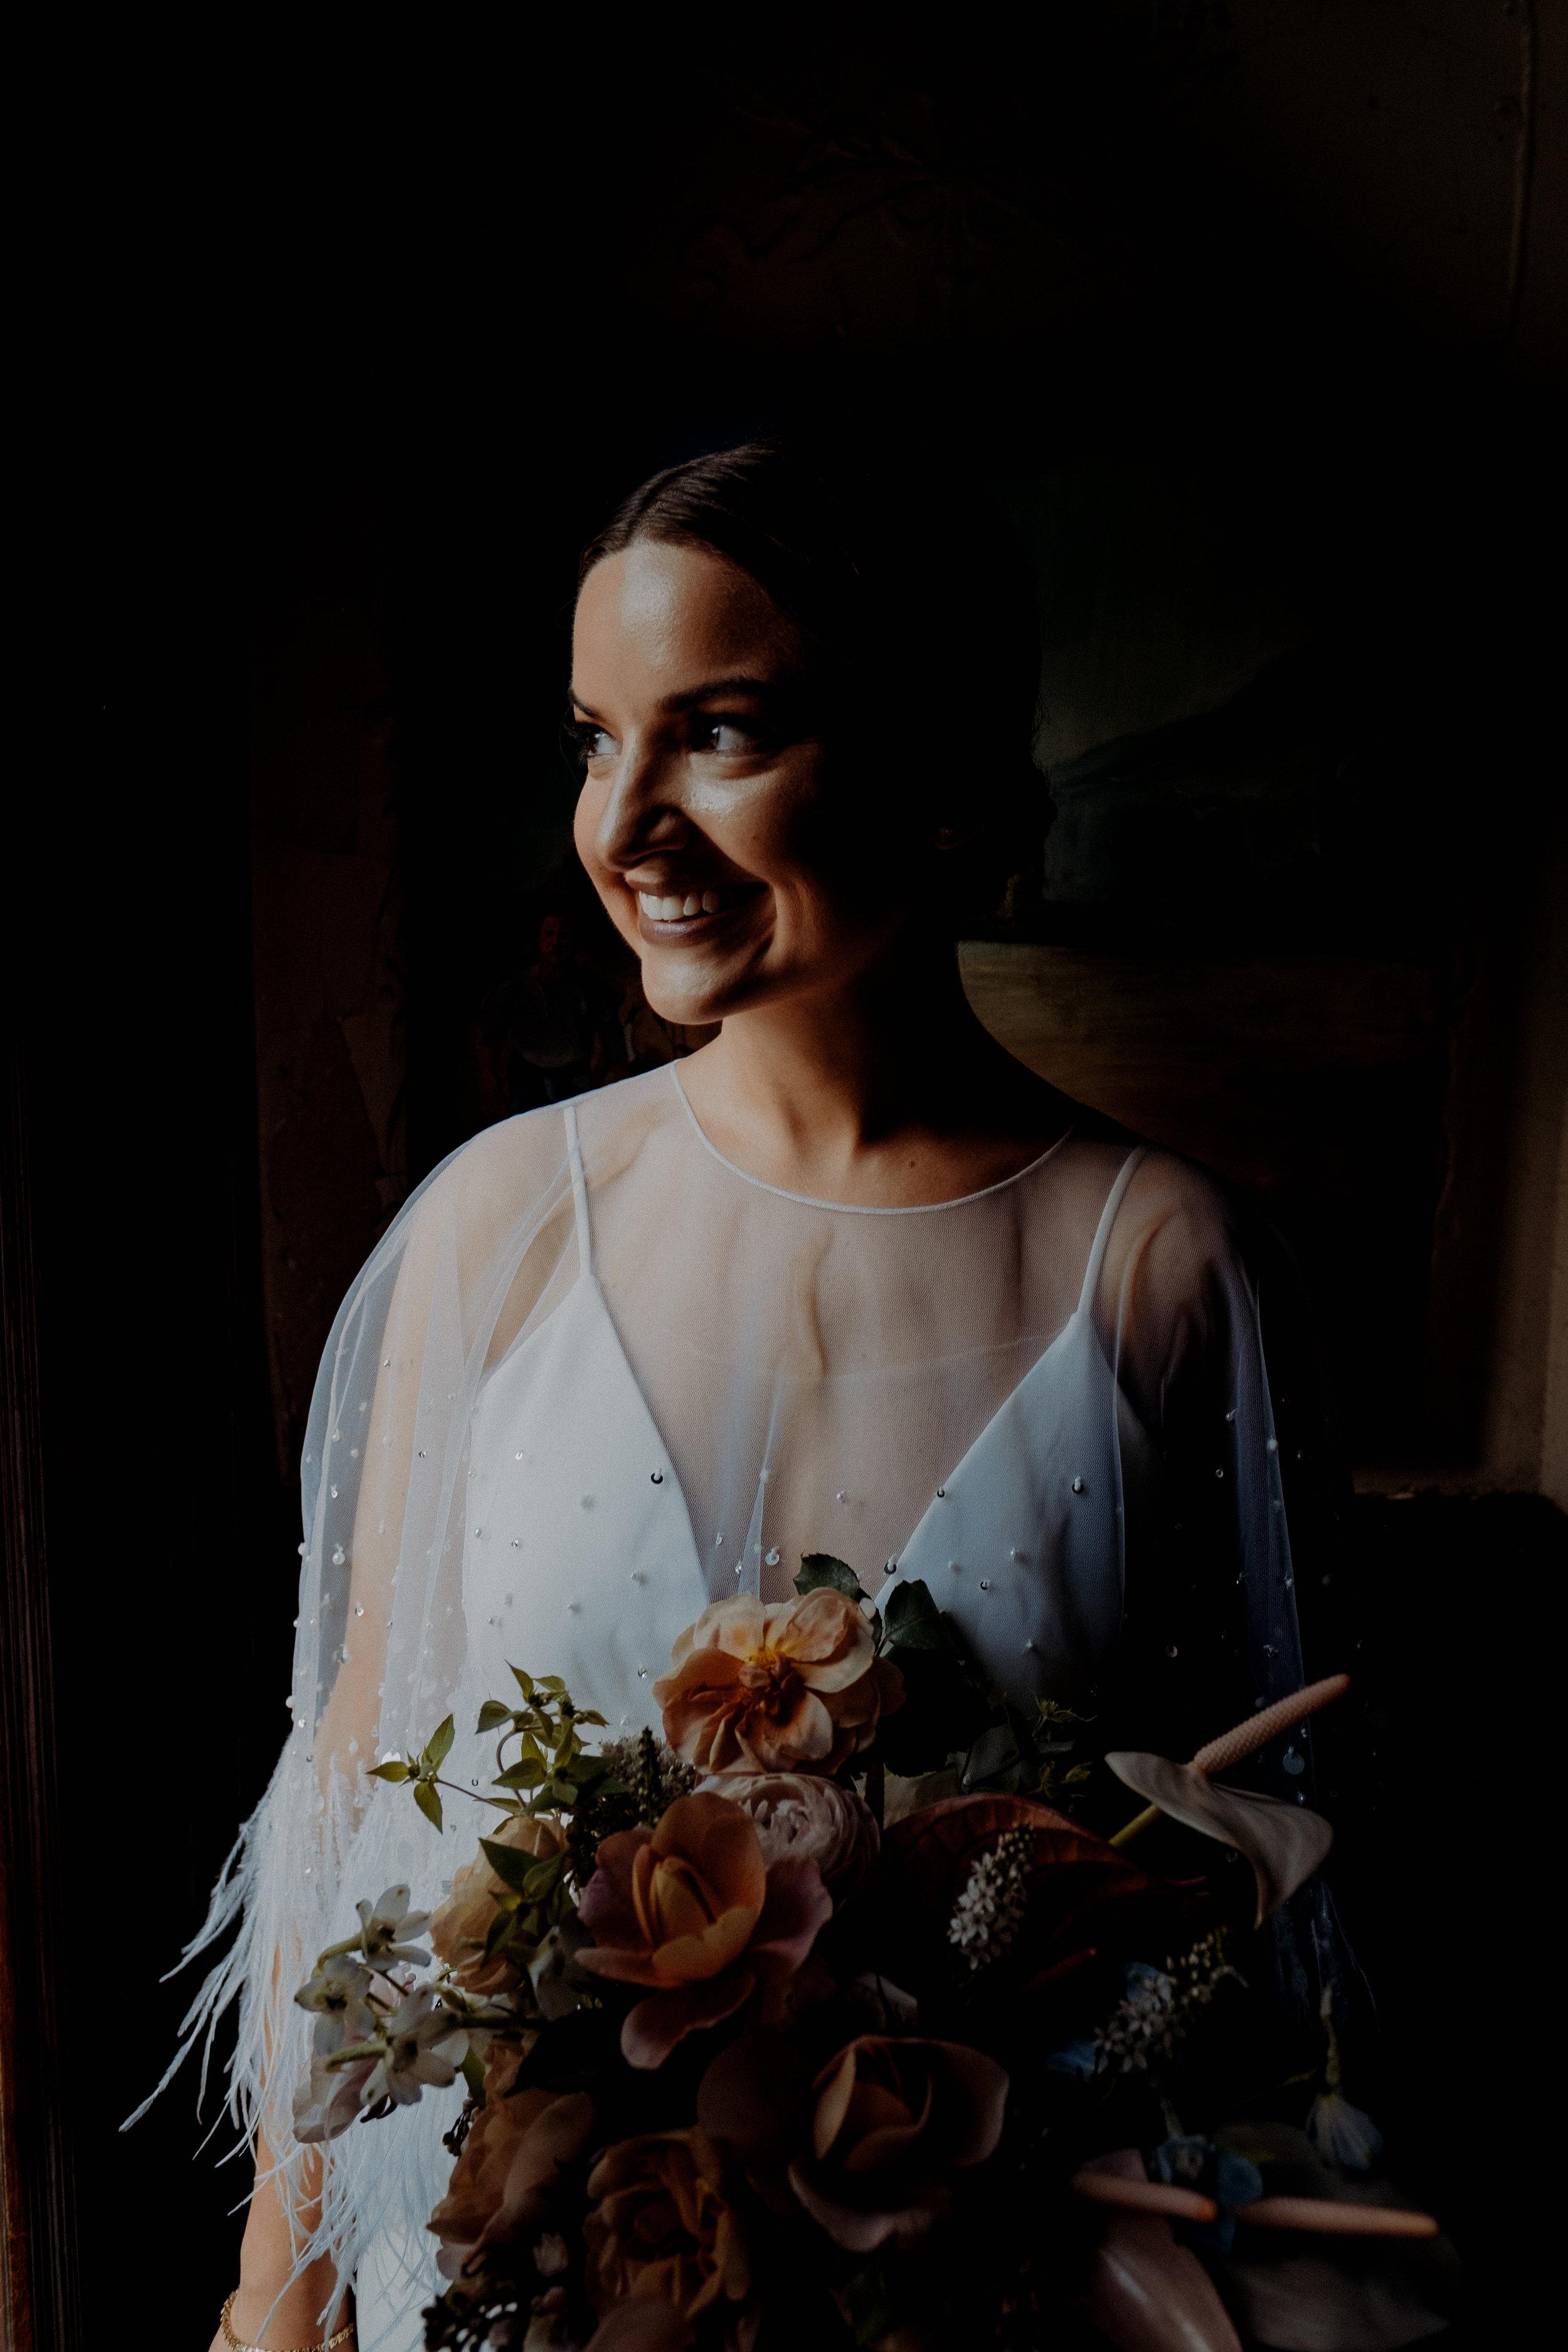 Chellise_Michael_Photography_Robertas_Brooklyn_Wedding_Photographer-220.jpg